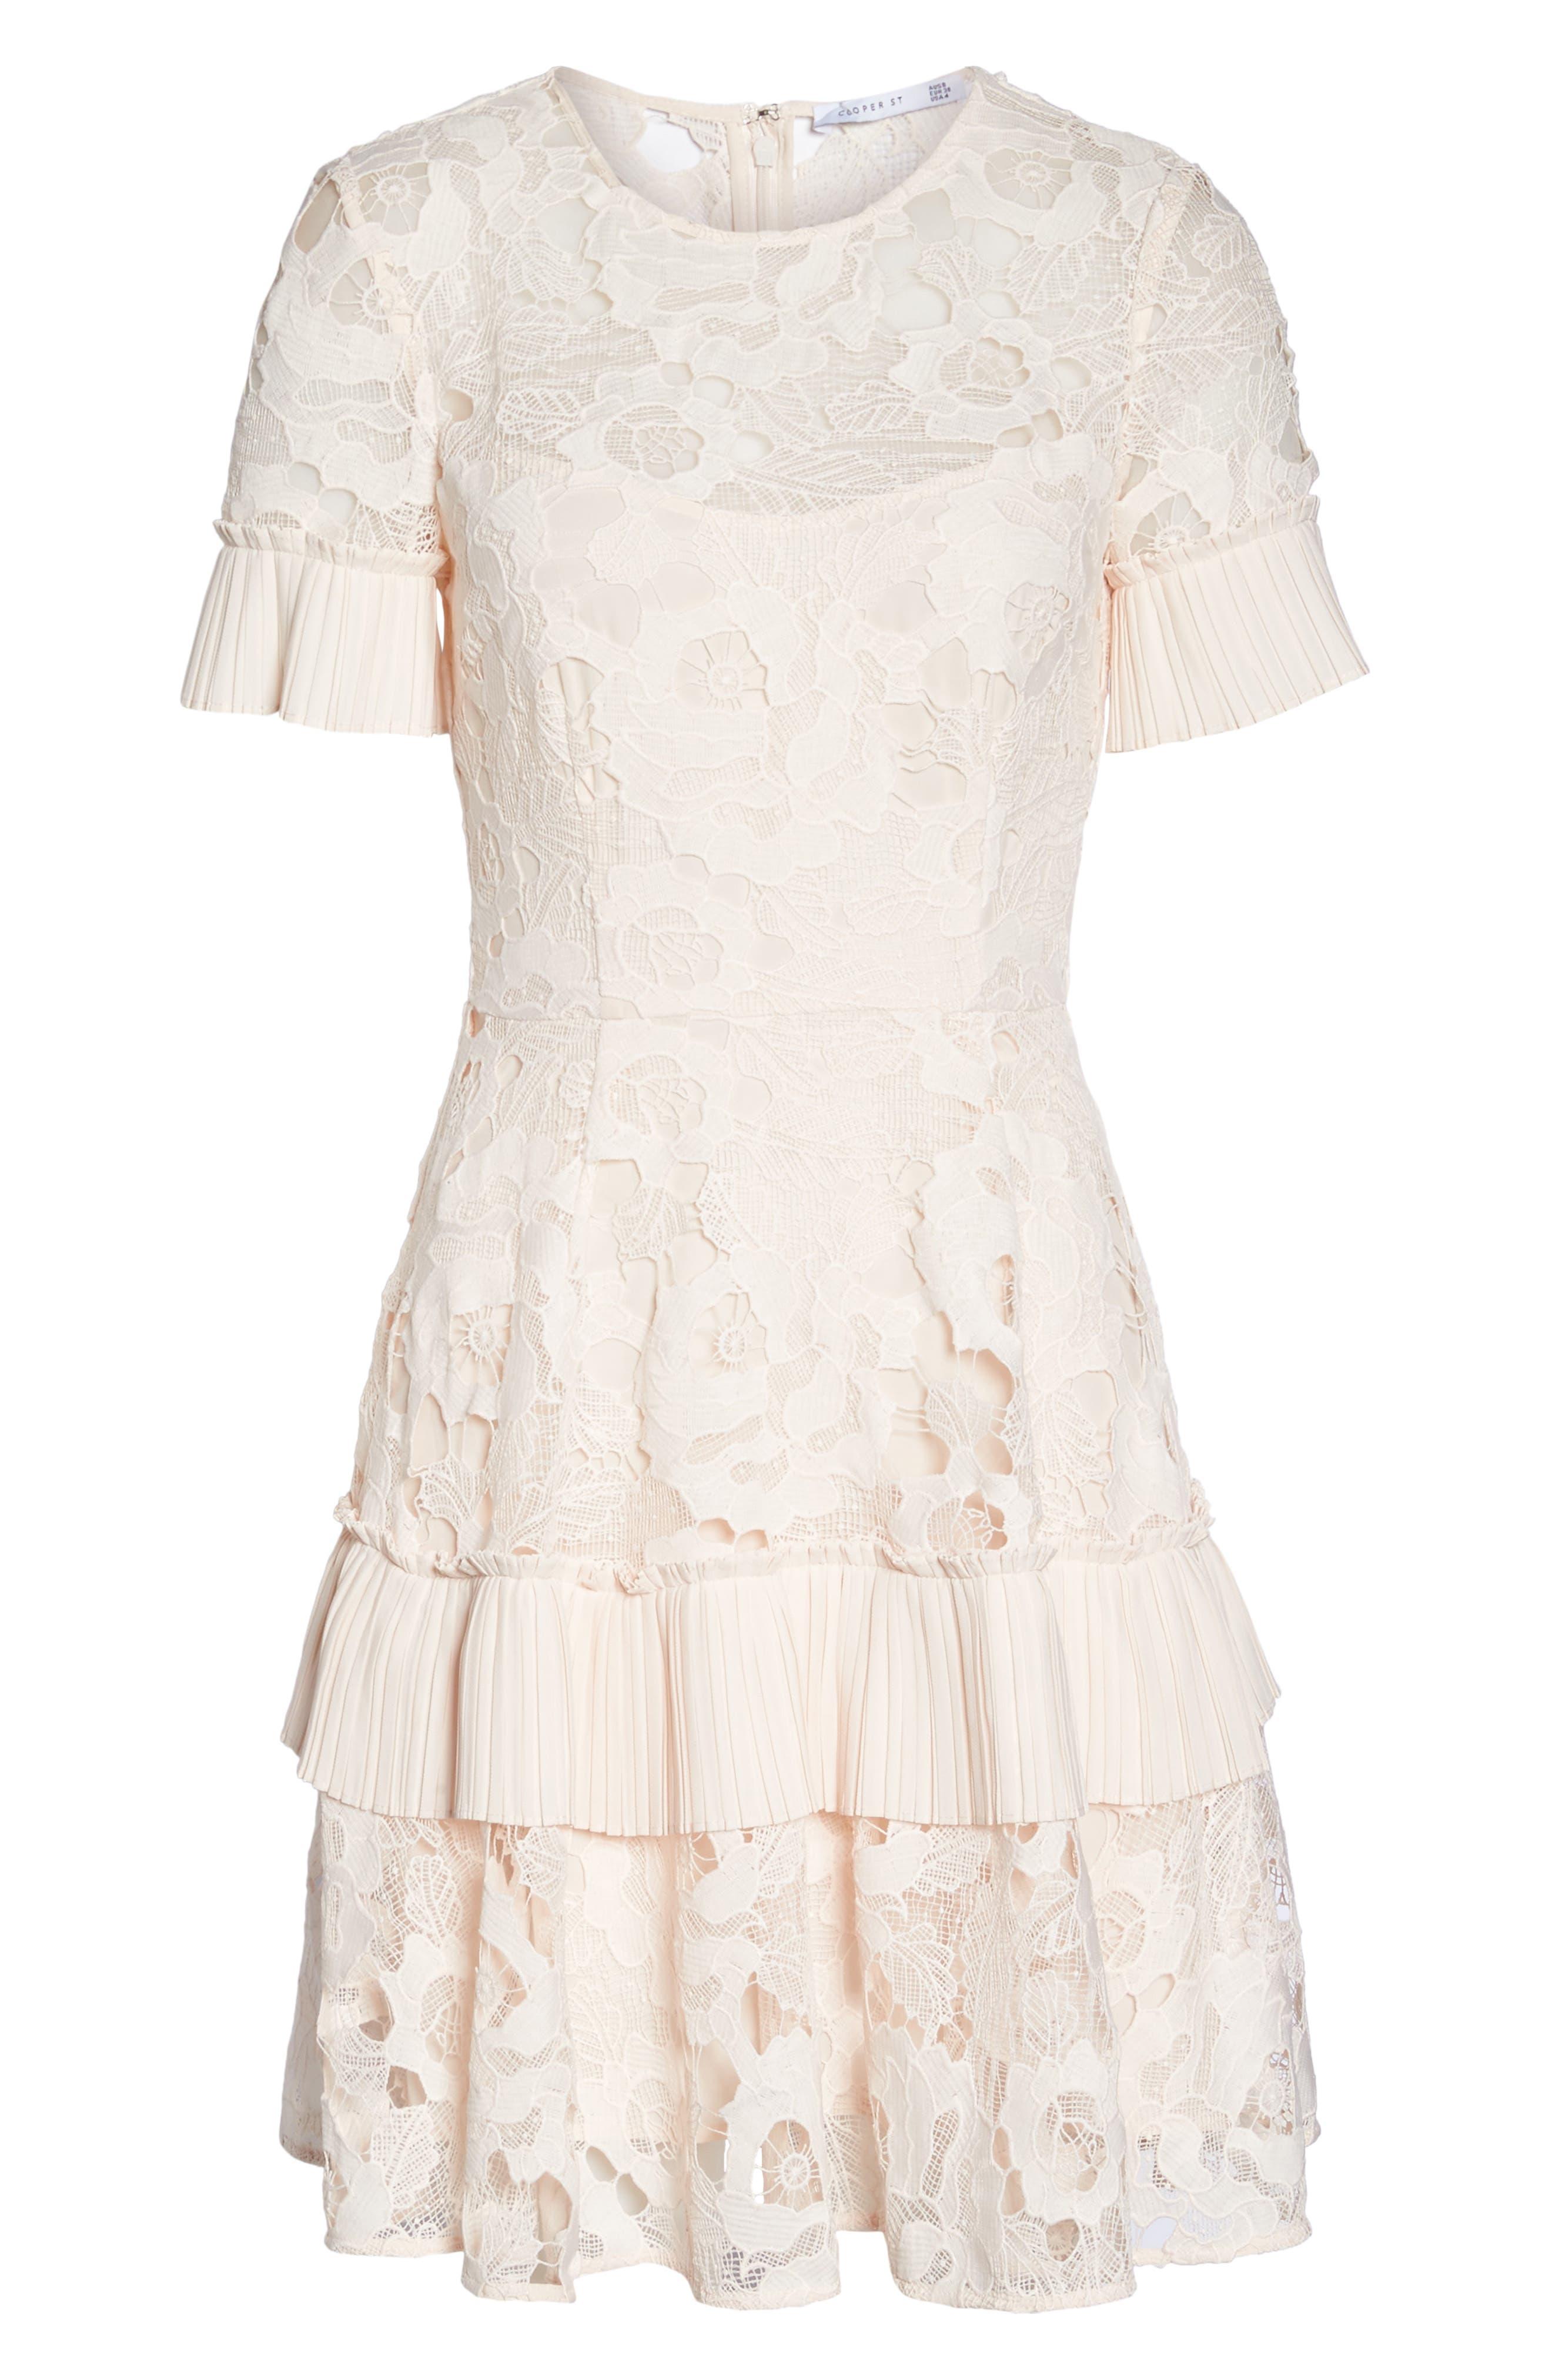 Enchantment Lace Fit & Flare Dress,                             Alternate thumbnail 6, color,                             650